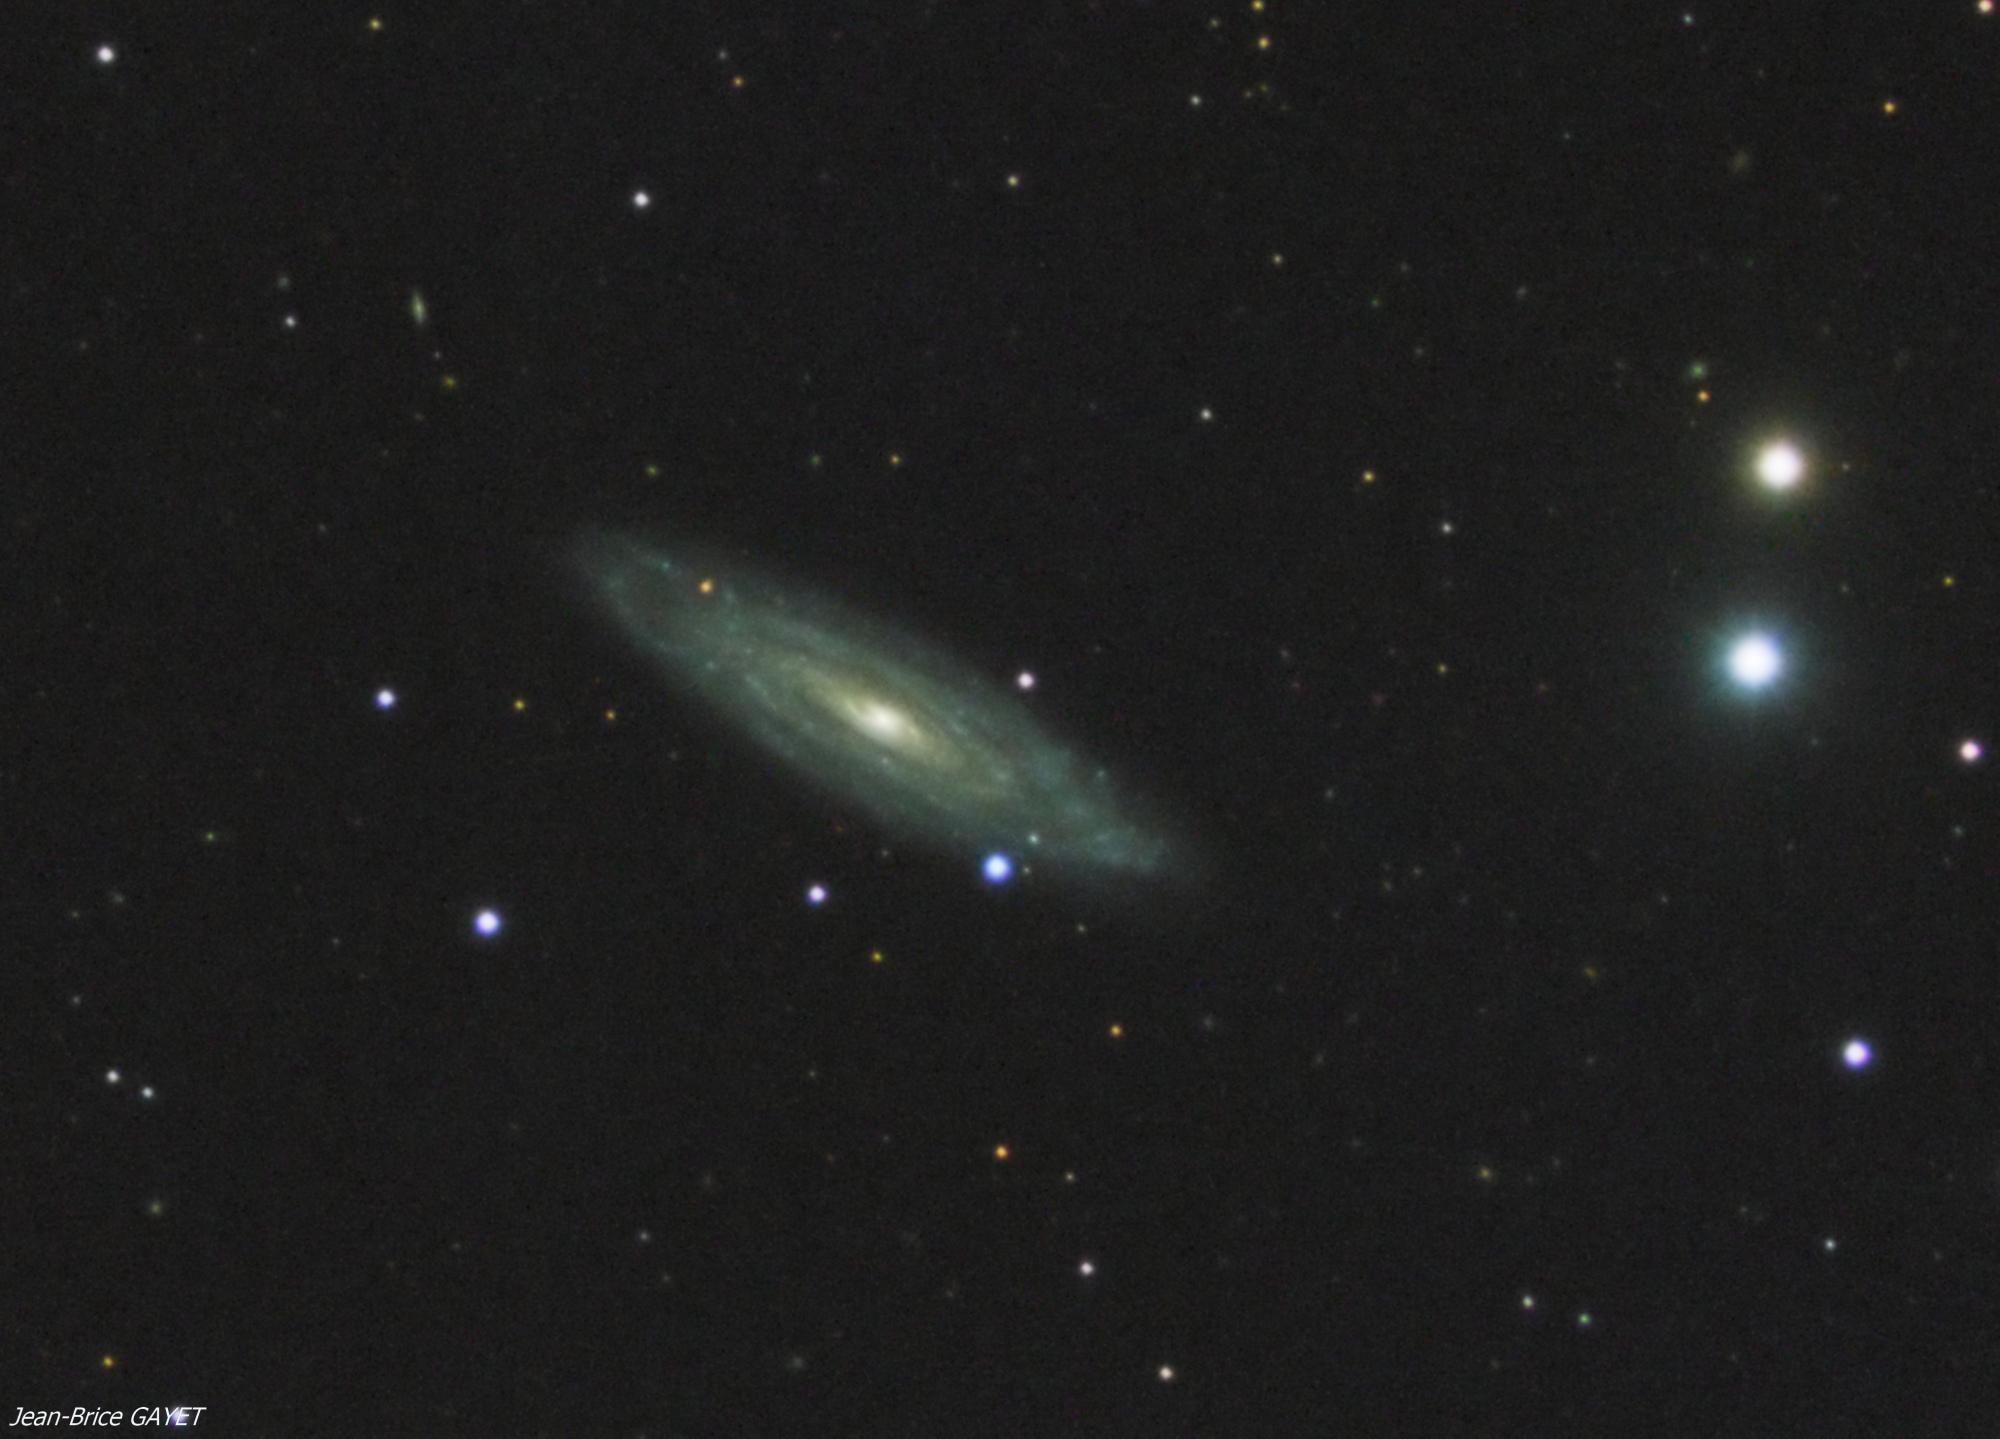 5c6687684dd05_NGC3254SN2019npcroppeV2Jean-BriceGAYET.thumb.jpg.af13febb88aa9d57a9a4a326bcc8df22.jpg